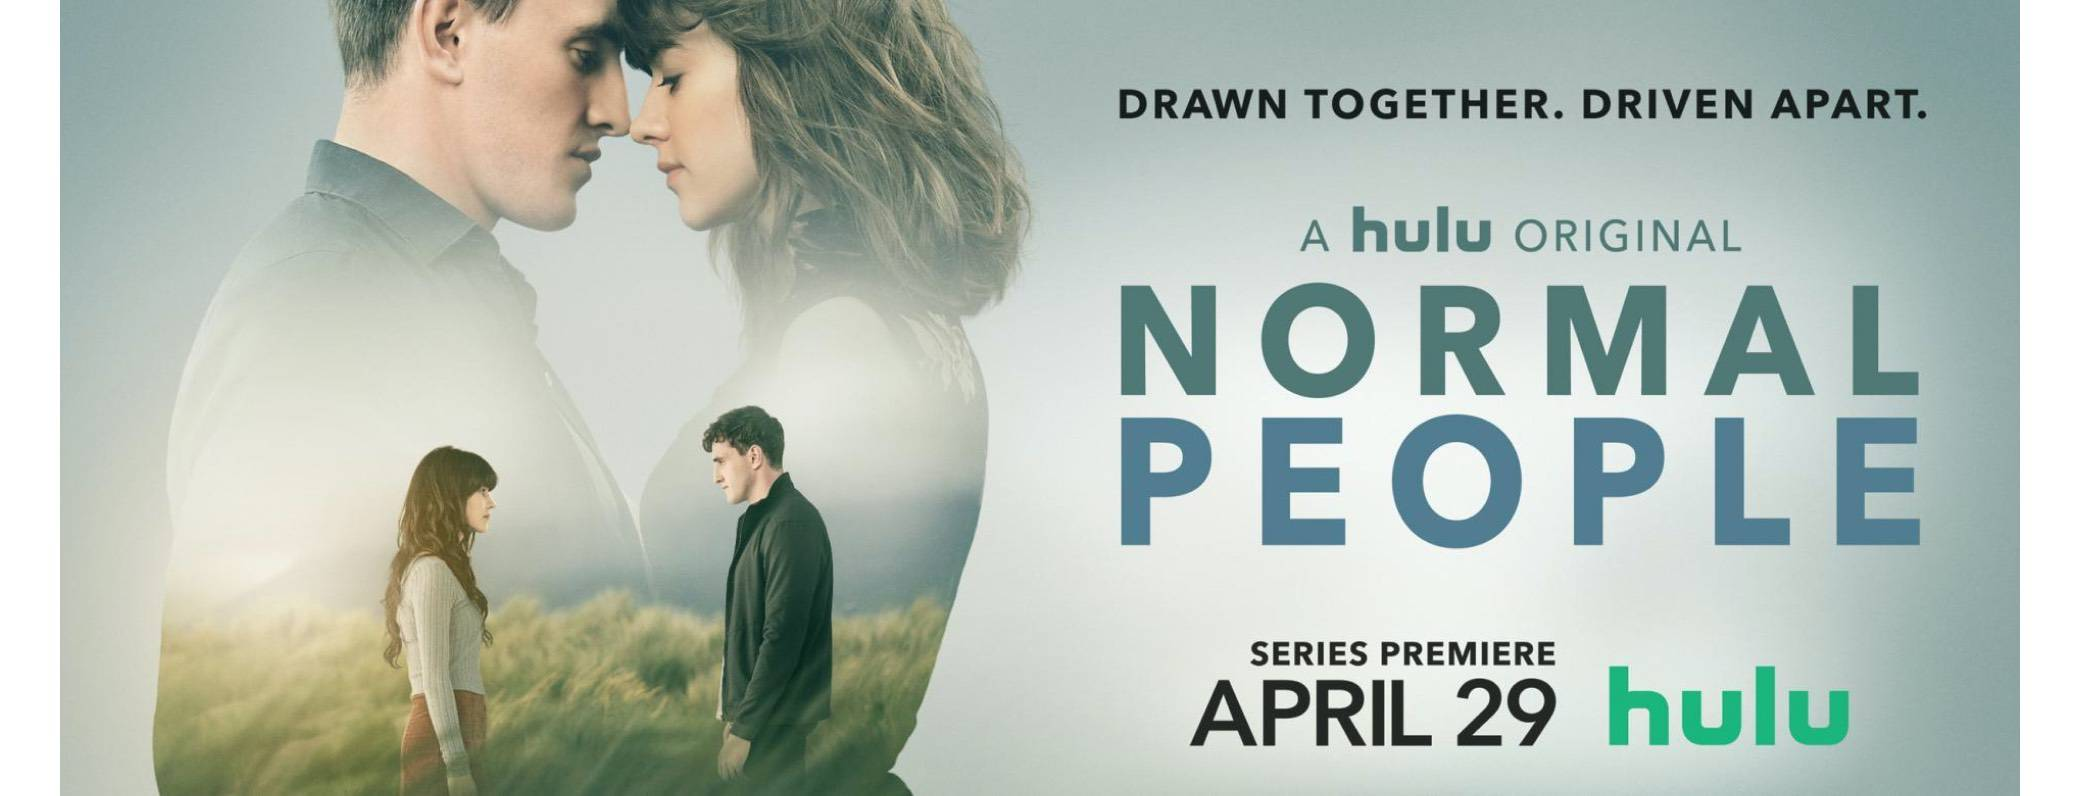 normal-people image